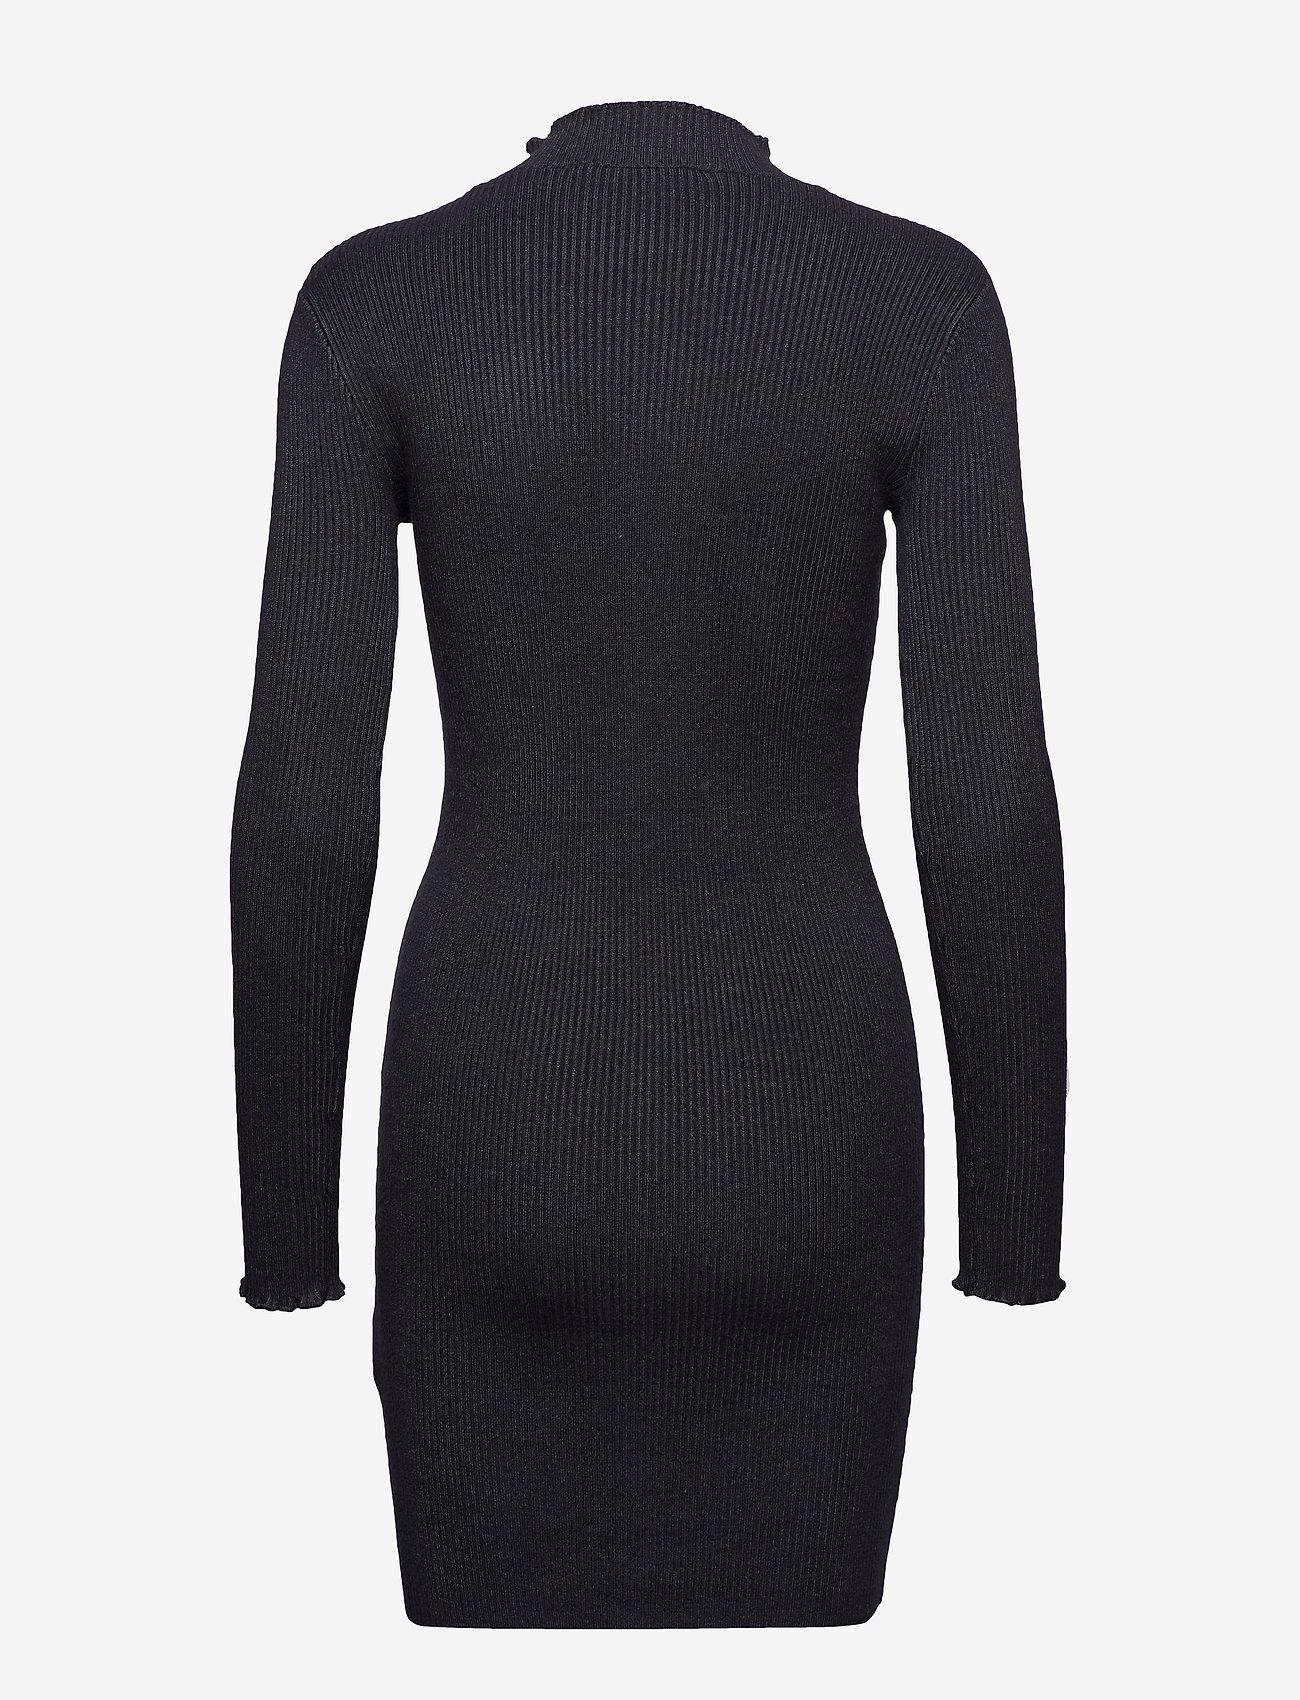 Superdry Liana Ribbed Knit Dress - Robes Black